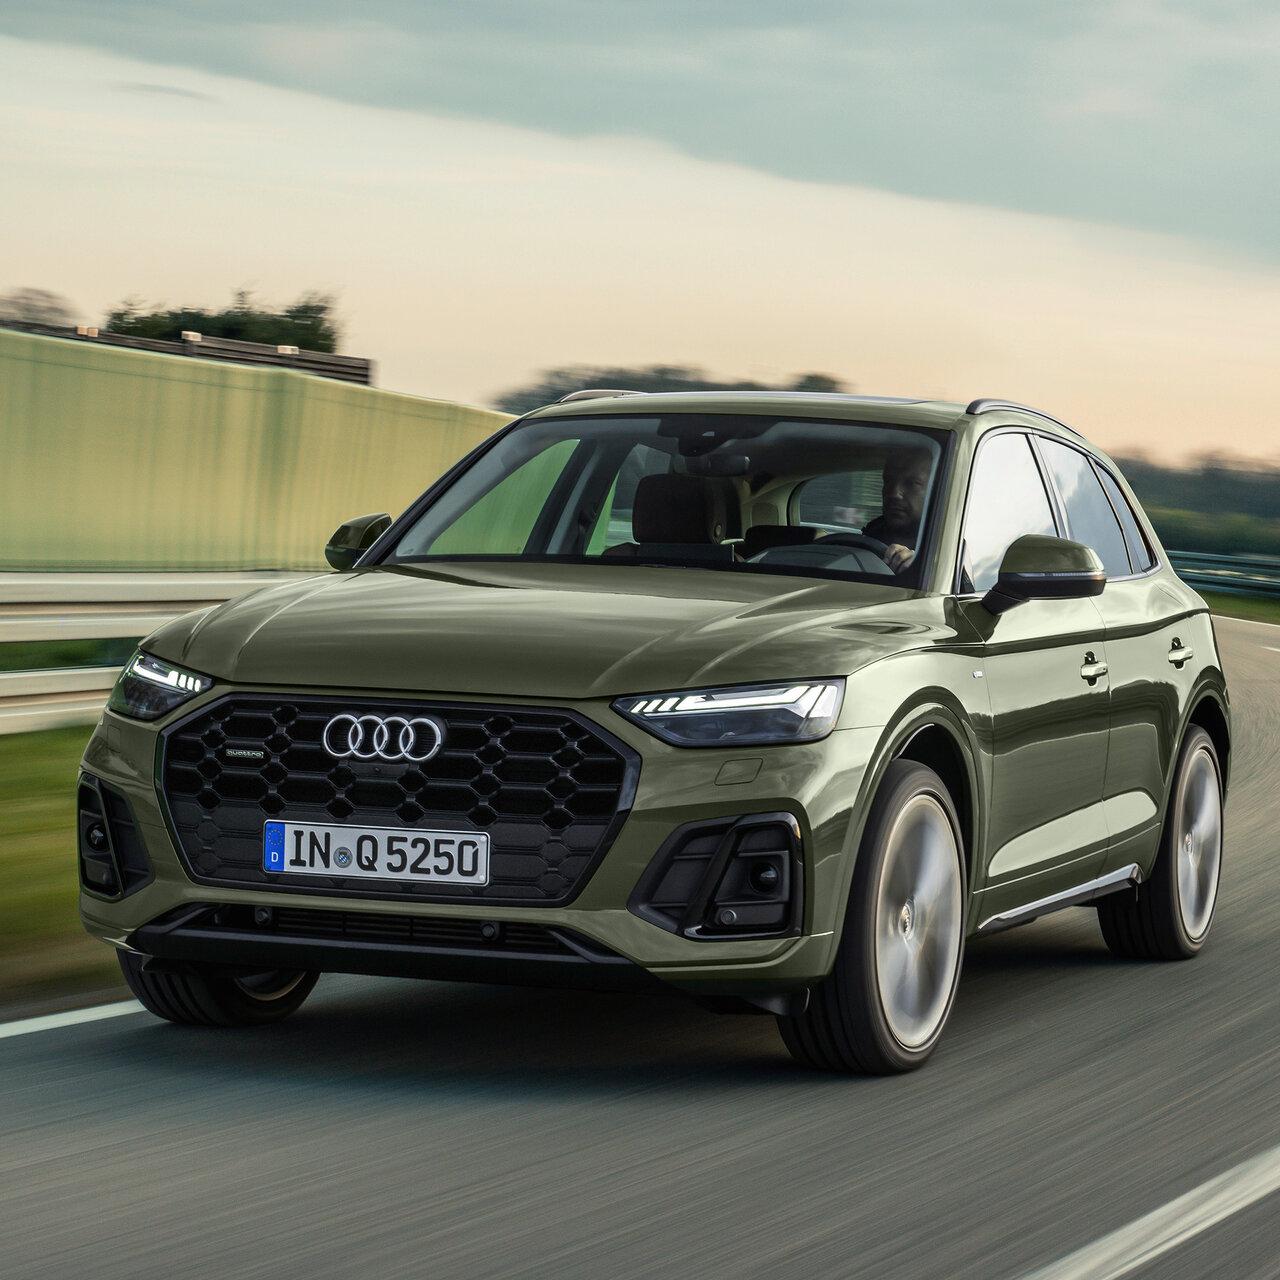 S lineをさらにスポーティで個性的に──Audi Q5 S line competition|Audi